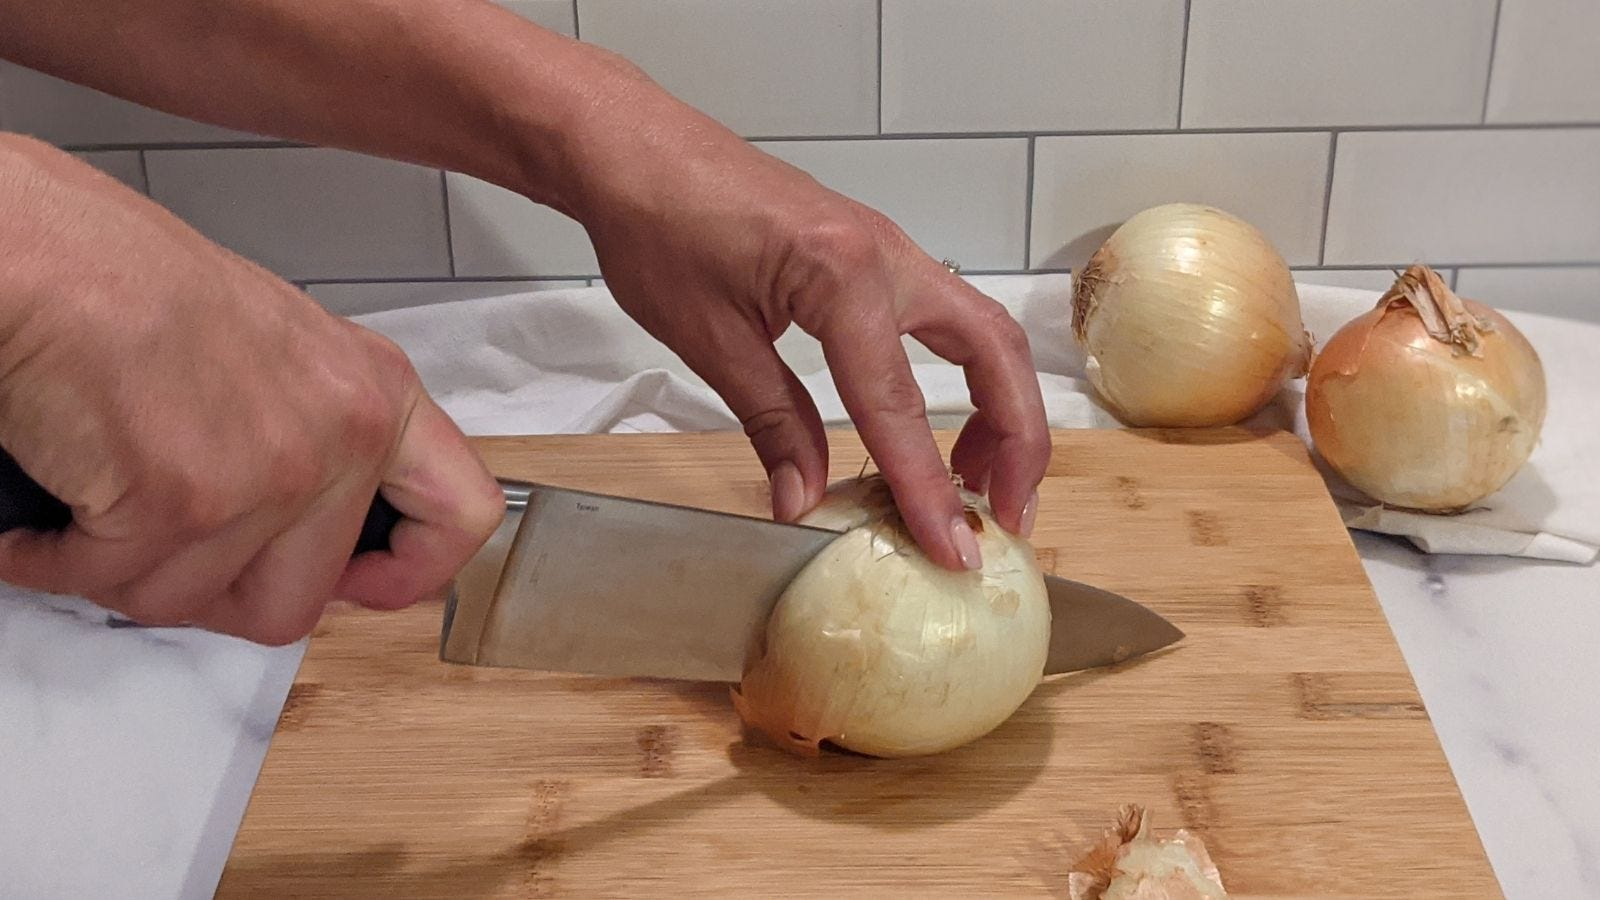 Slicing an onion in half before peeling it.